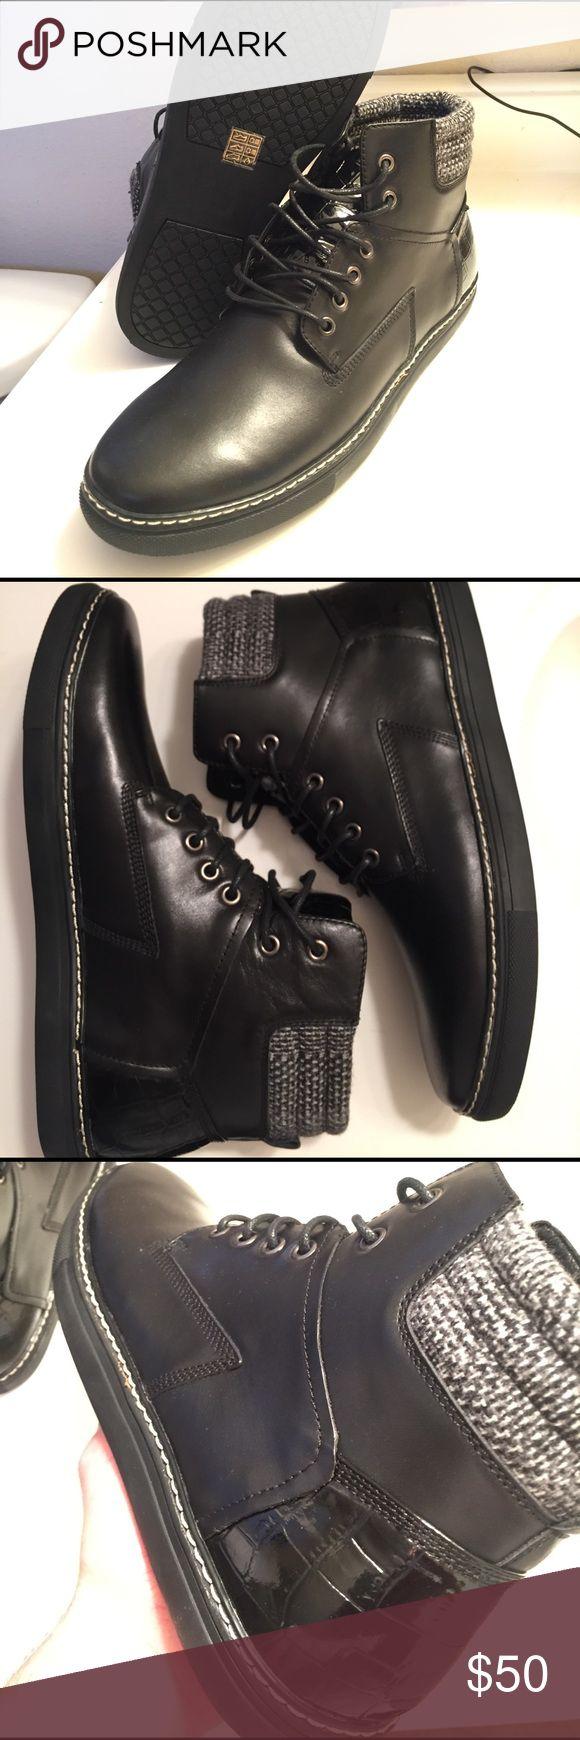 Joe's Benny Leather high top sneaker m 11 Brand new Joe's jeans benny leather high top sneaker size 11. Brand new unworn. Joe's Jeans Shoes Sneakers